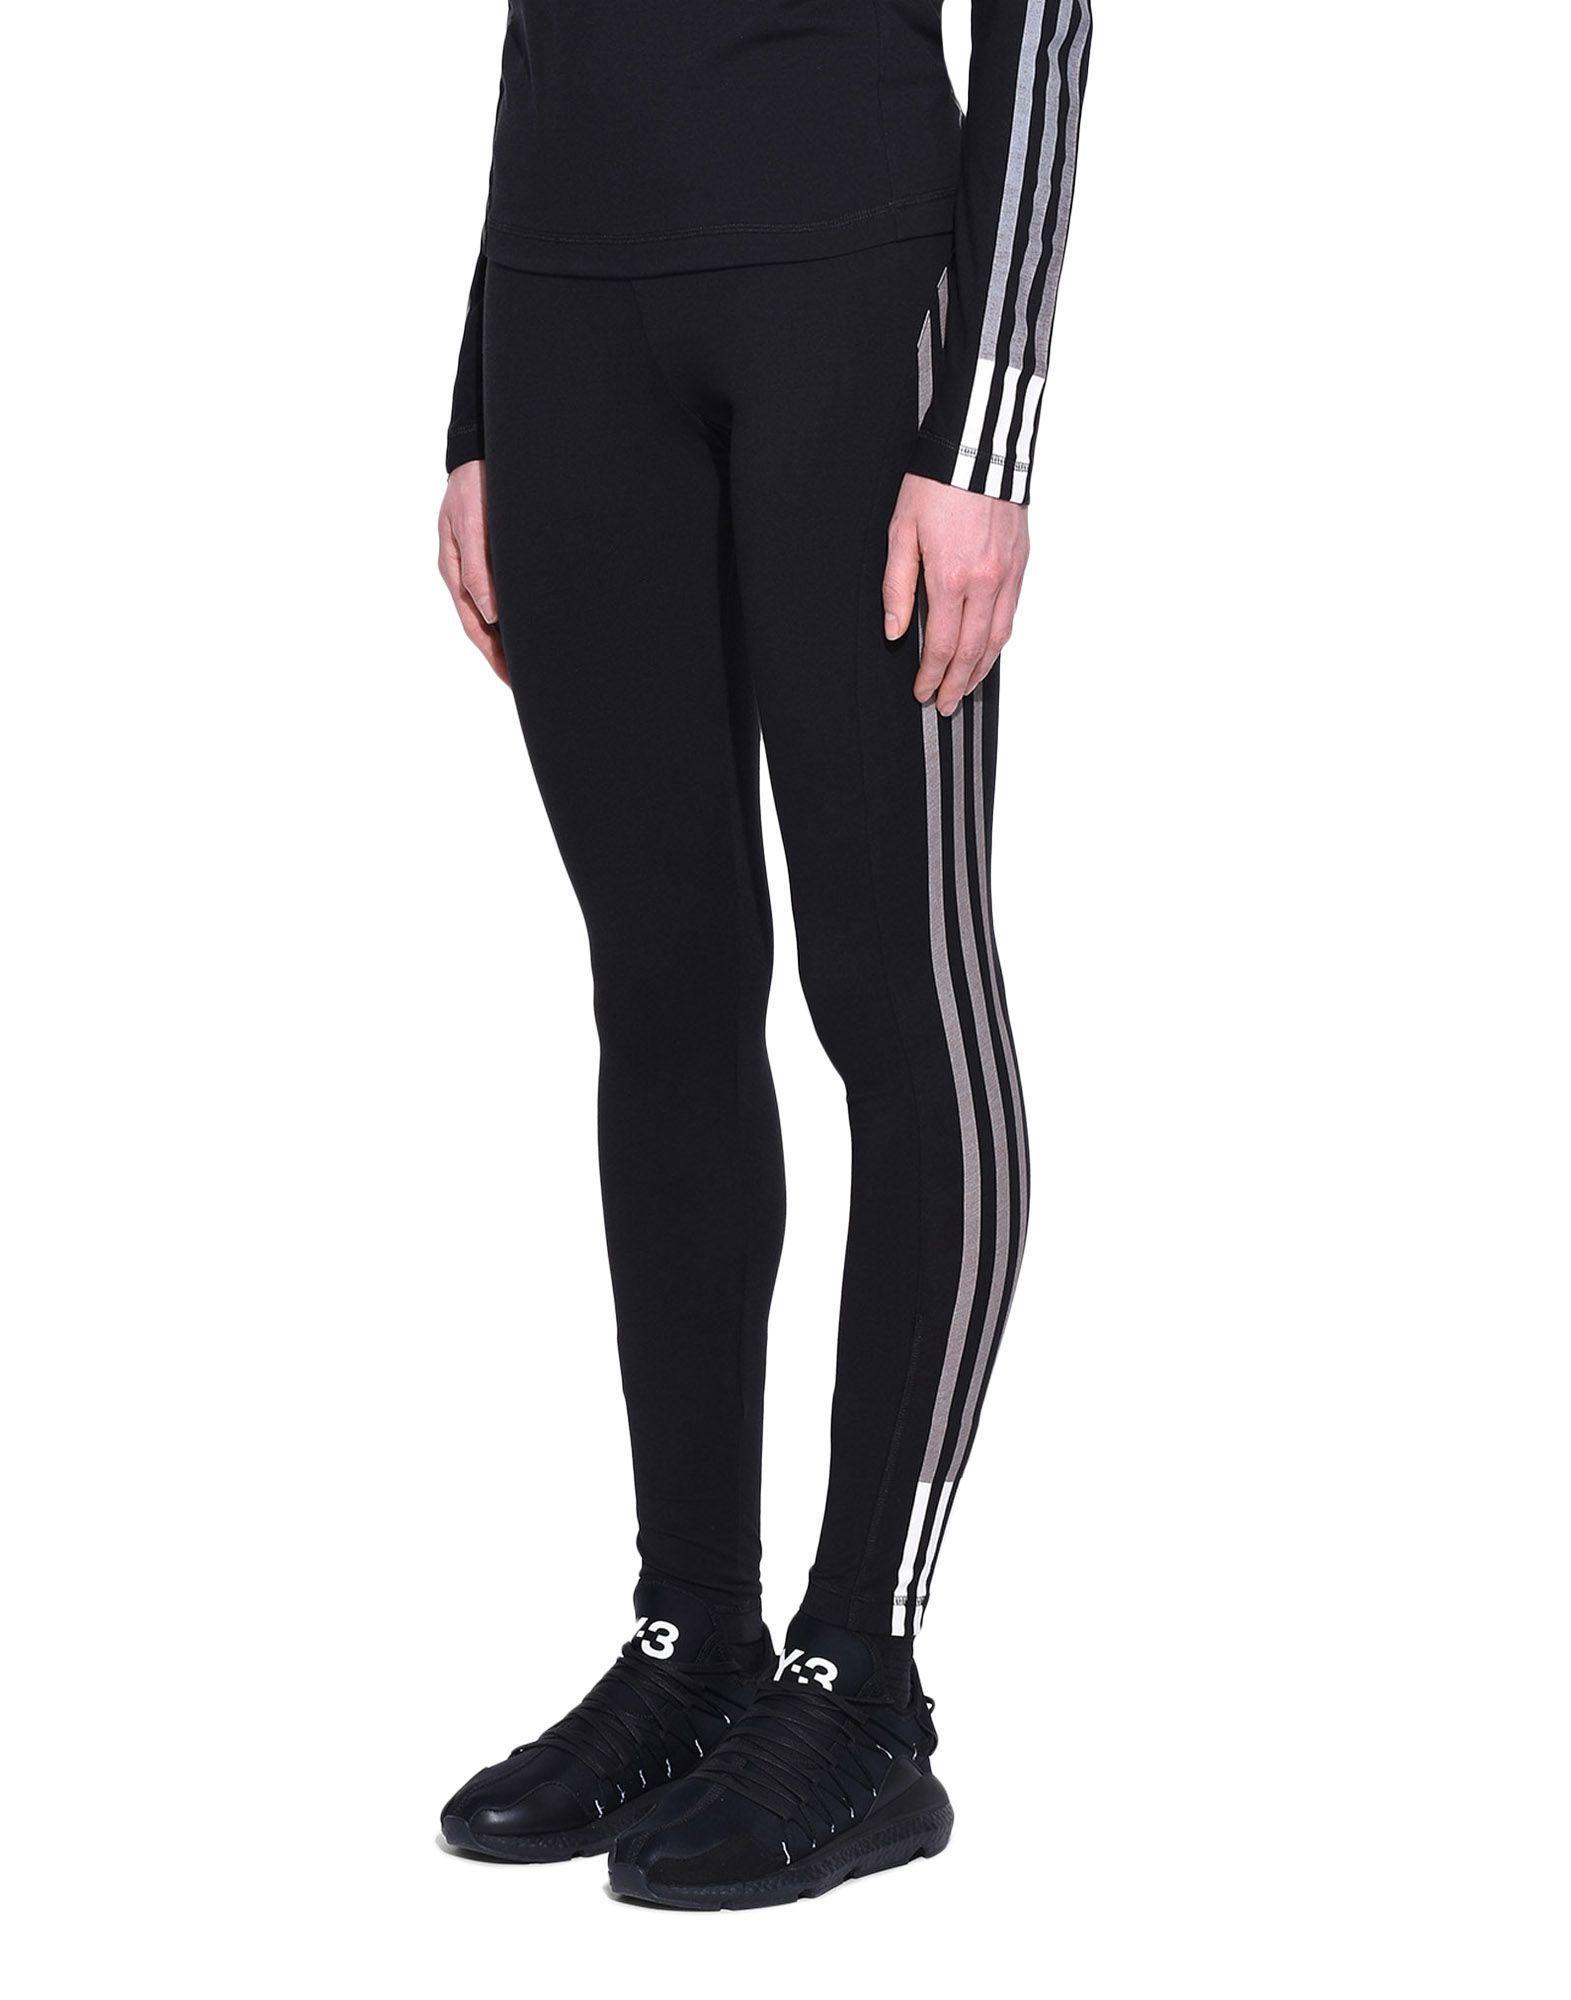 Y-3 Y-3 3-Stripes Leggings Leggings Damen e